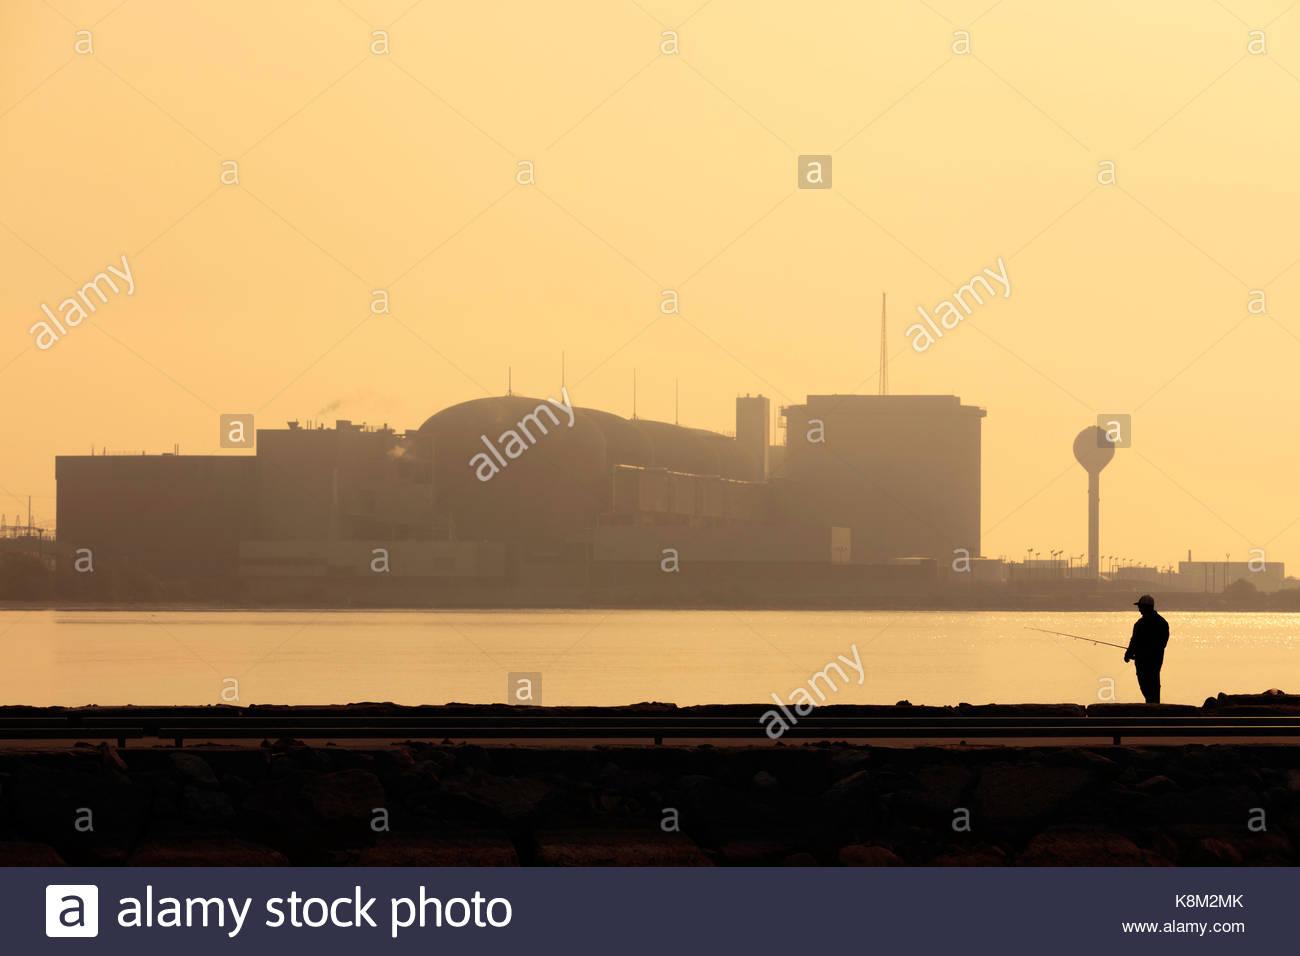 Candu Nuclear electric power station Reaktor produziert elektrische Energie Atomkraft in Pickering Ontario Kanada Stockbild